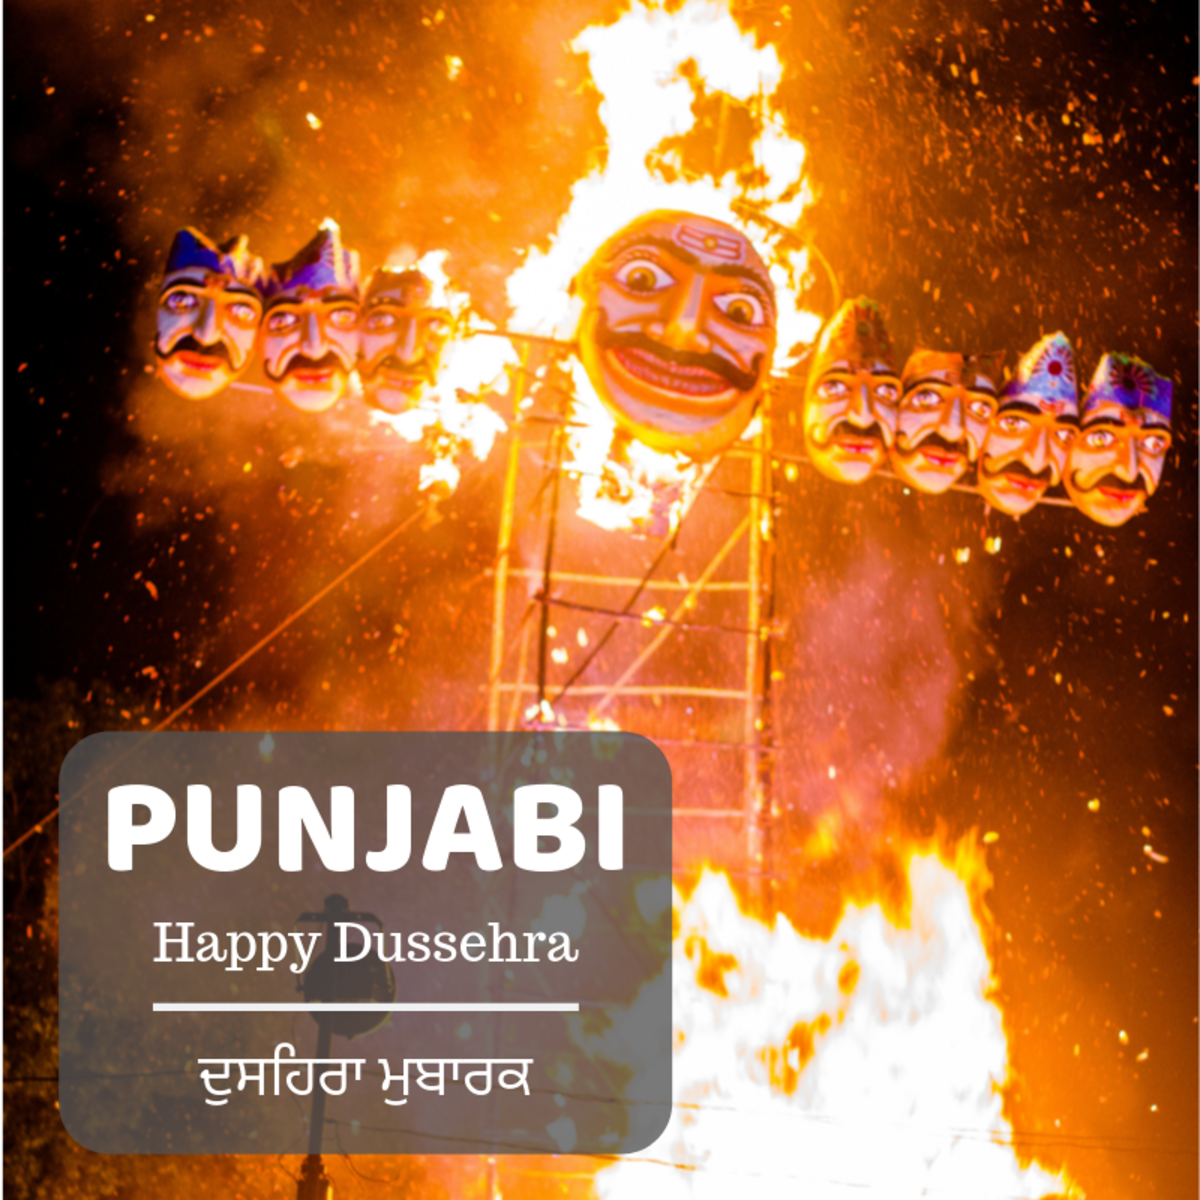 Happy Dussehra—ਦੁਸਹਿਰਾ ਮੁਬਾਰਕ